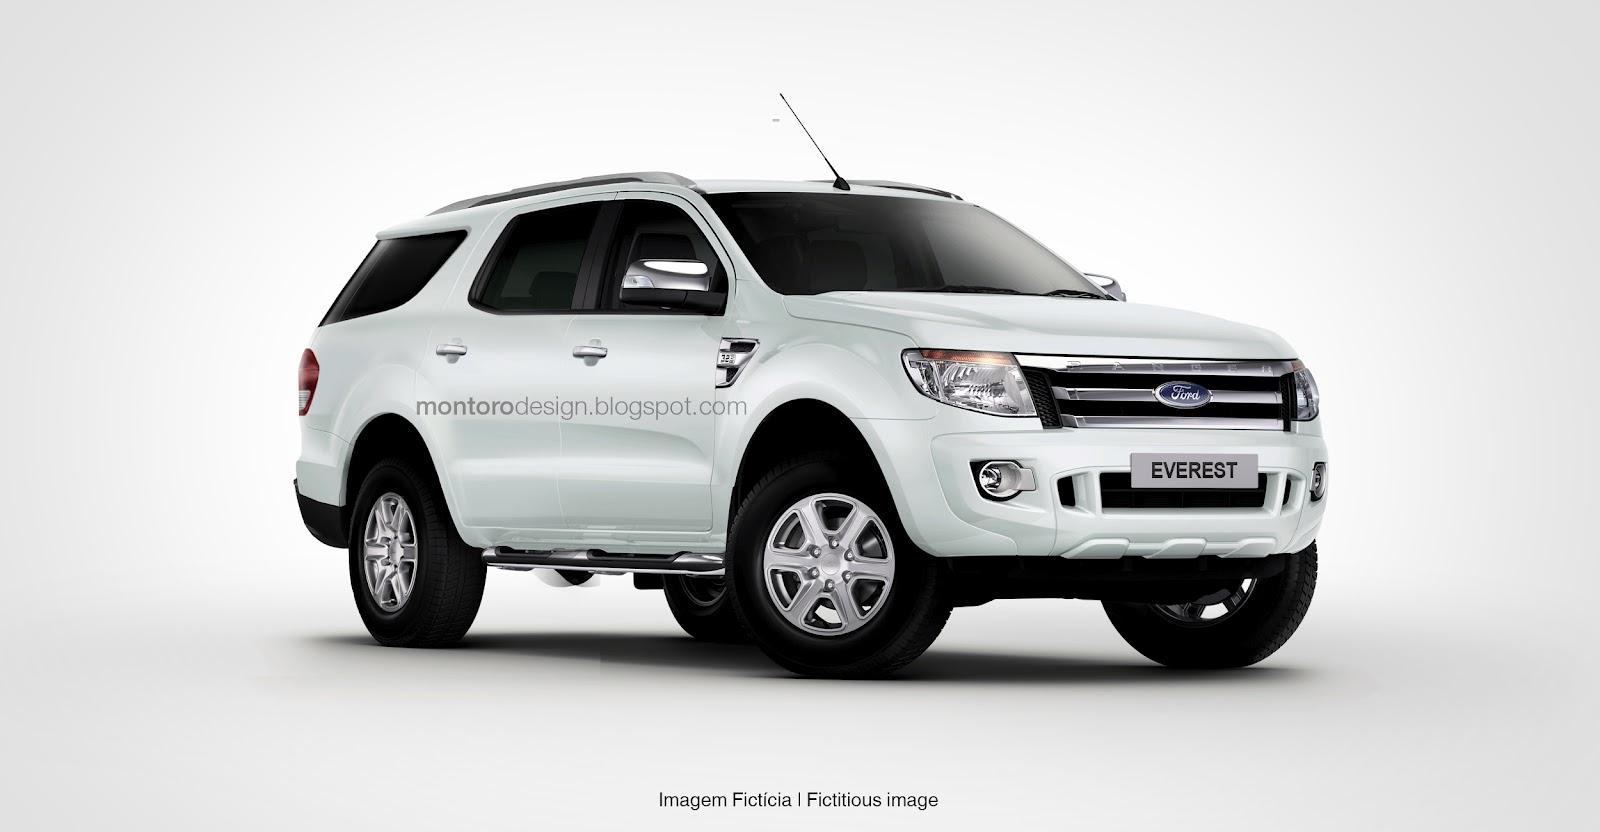 Ford Ranger SUV 2014 [Photos] ~ Cheftonio's Blog